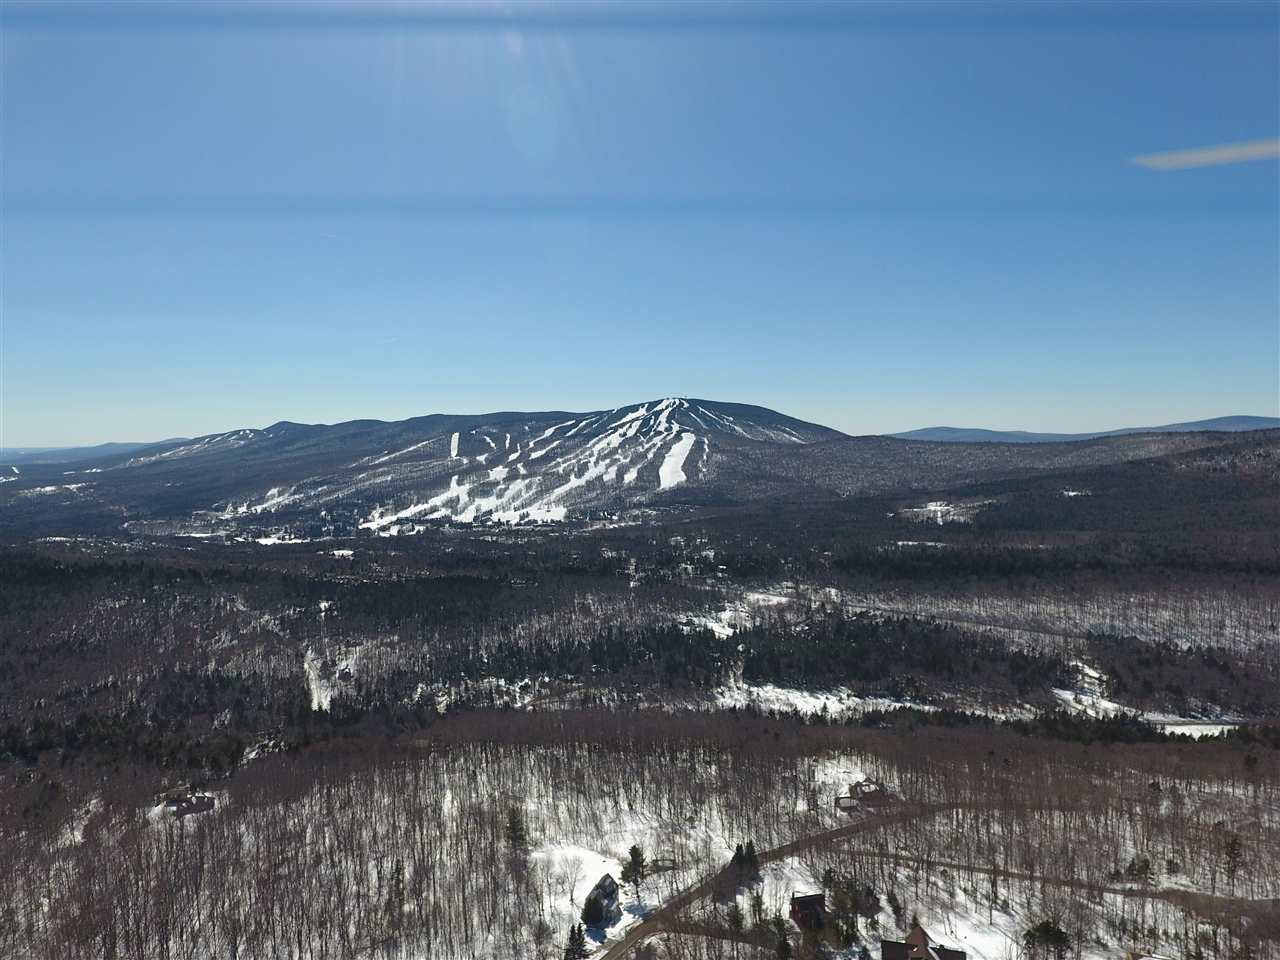 Mount-Snow-Real-Estate-4502410-1